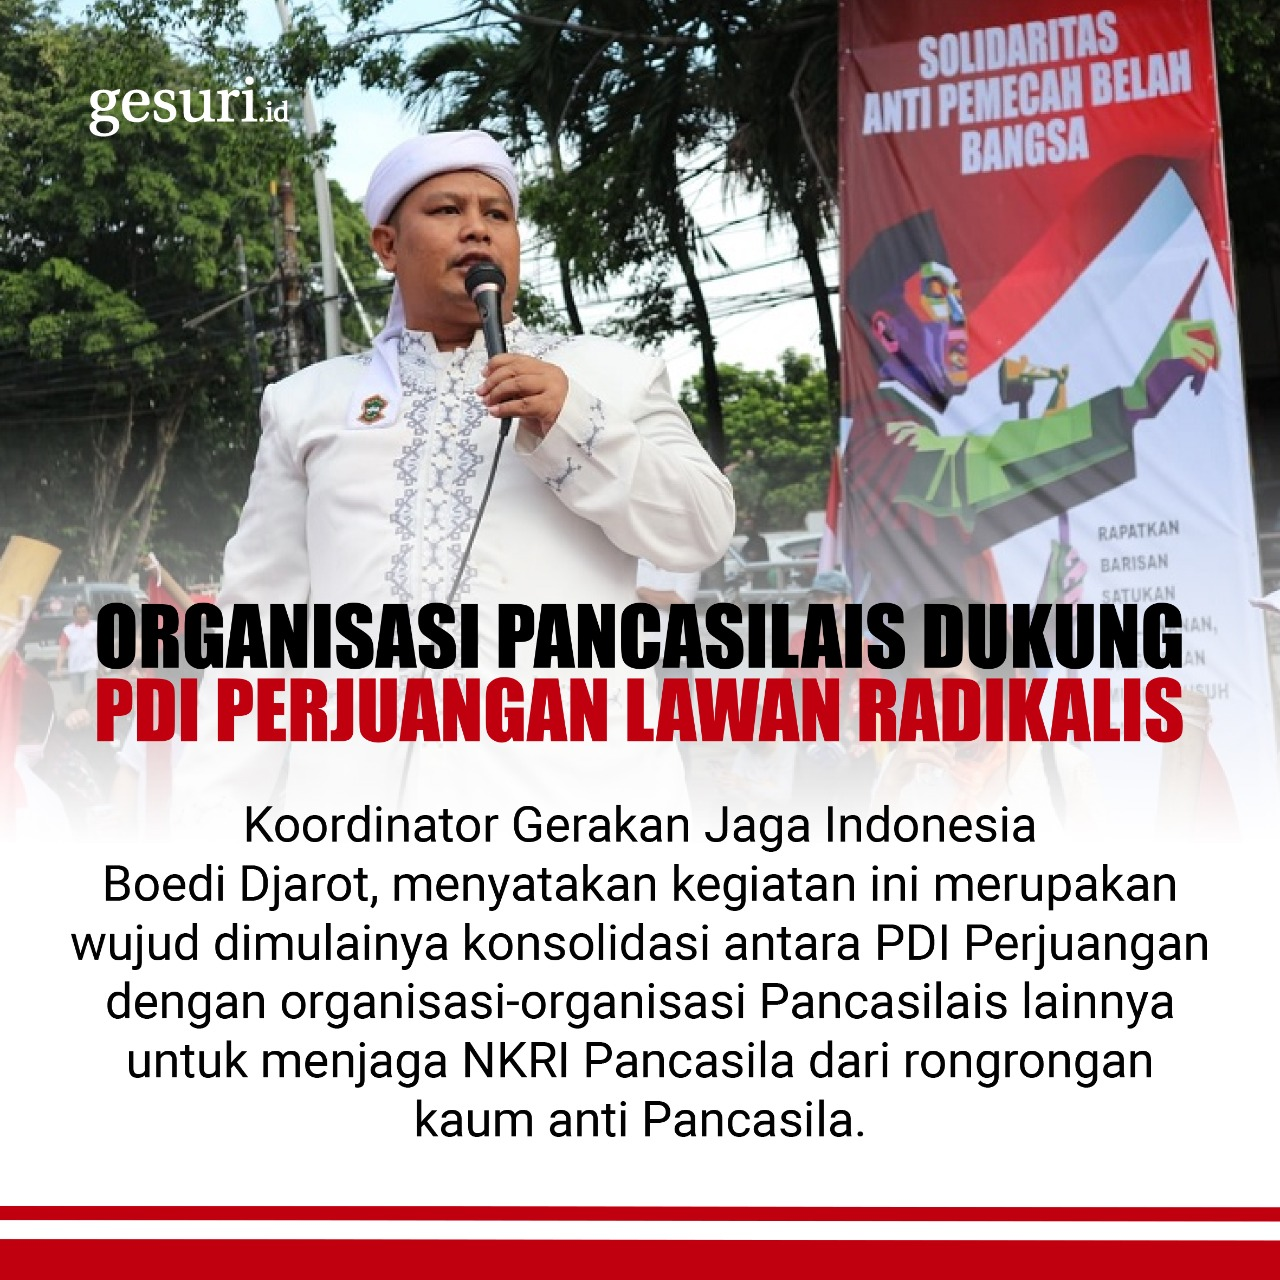 Organisasi Pancasilais Dukung PDI Perjuangan Lawan Radikalis